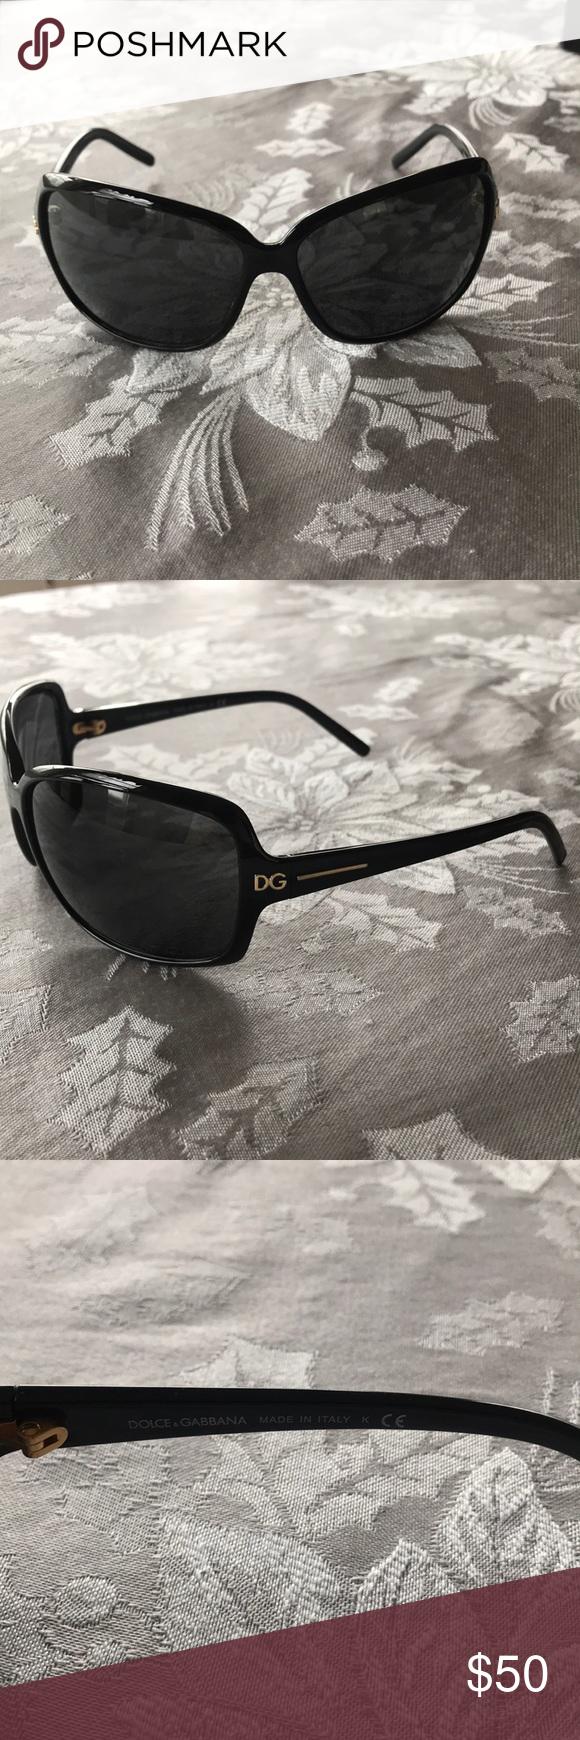 4d844145ffae Dolce   Gabbana sunglasses DG6016 501 87 Dolce   Gabbana sunglasses DG6016  501 87